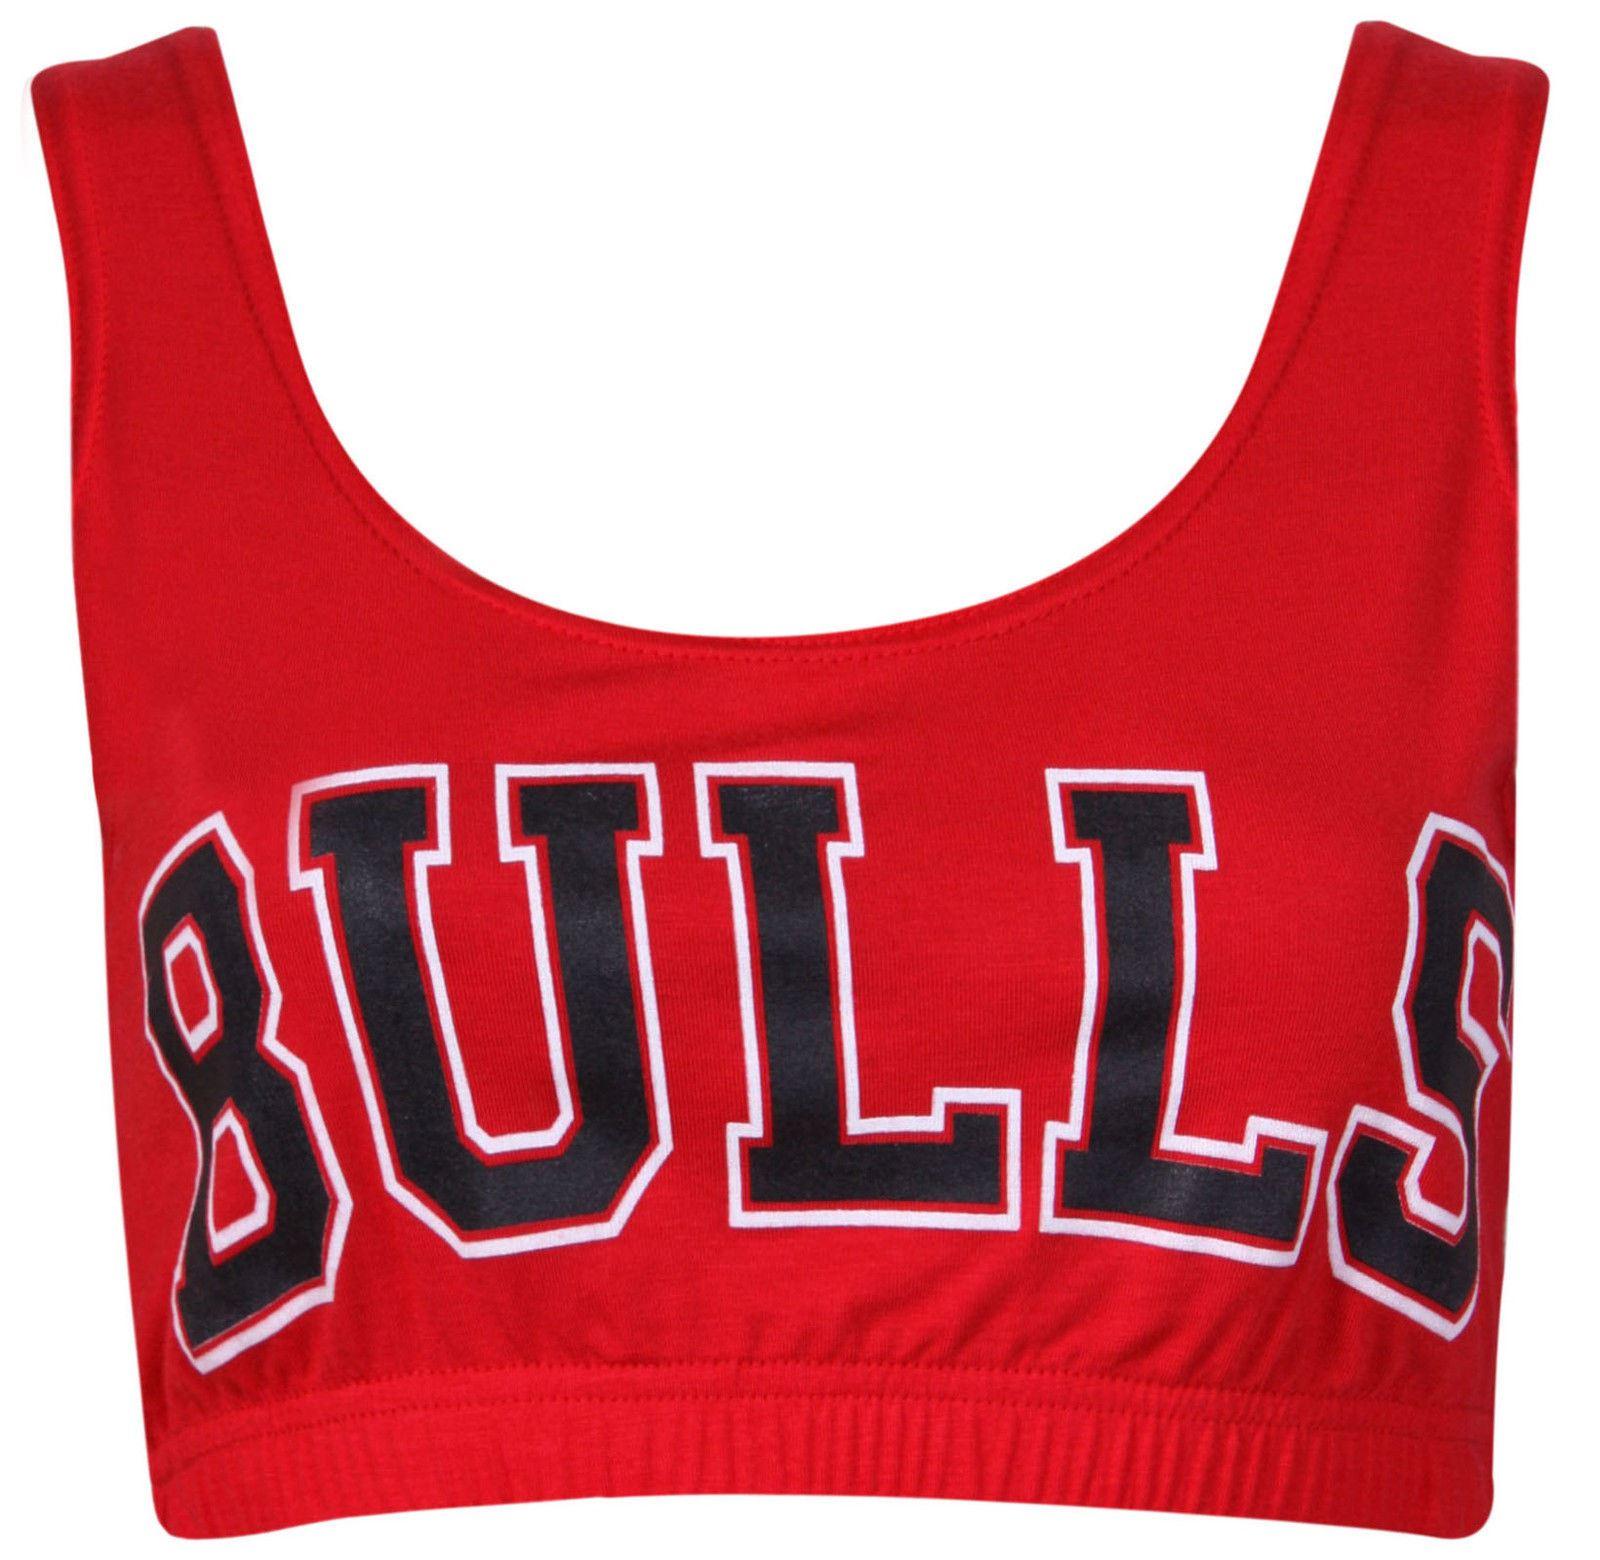 WOMENS LADIES GYM WORKOUT CHICAGO BULLS BASKETBAL CROP TOP BRALET 8 10 12 14